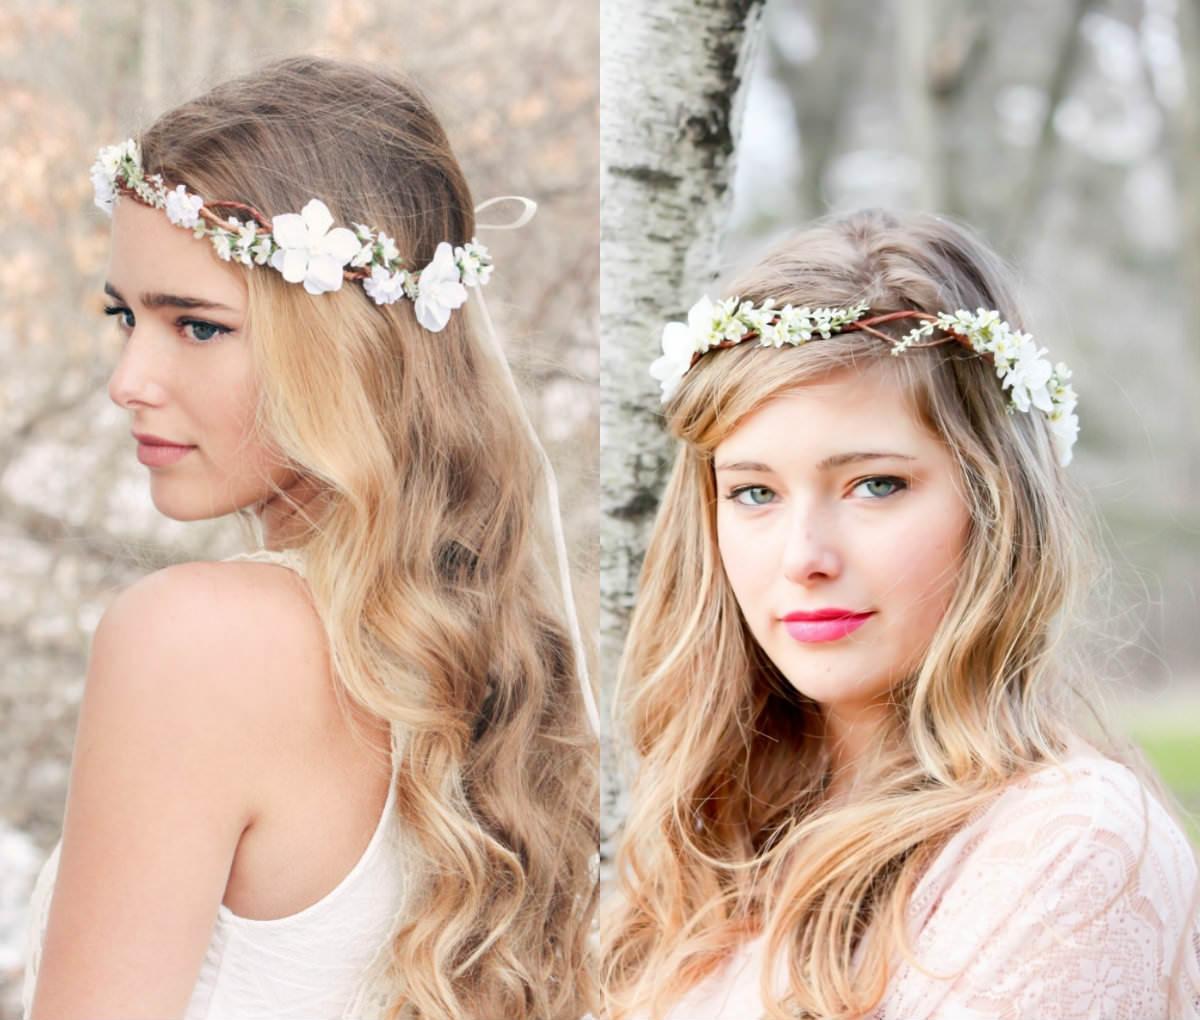 thin-flower-crown-bridal-hairstyles